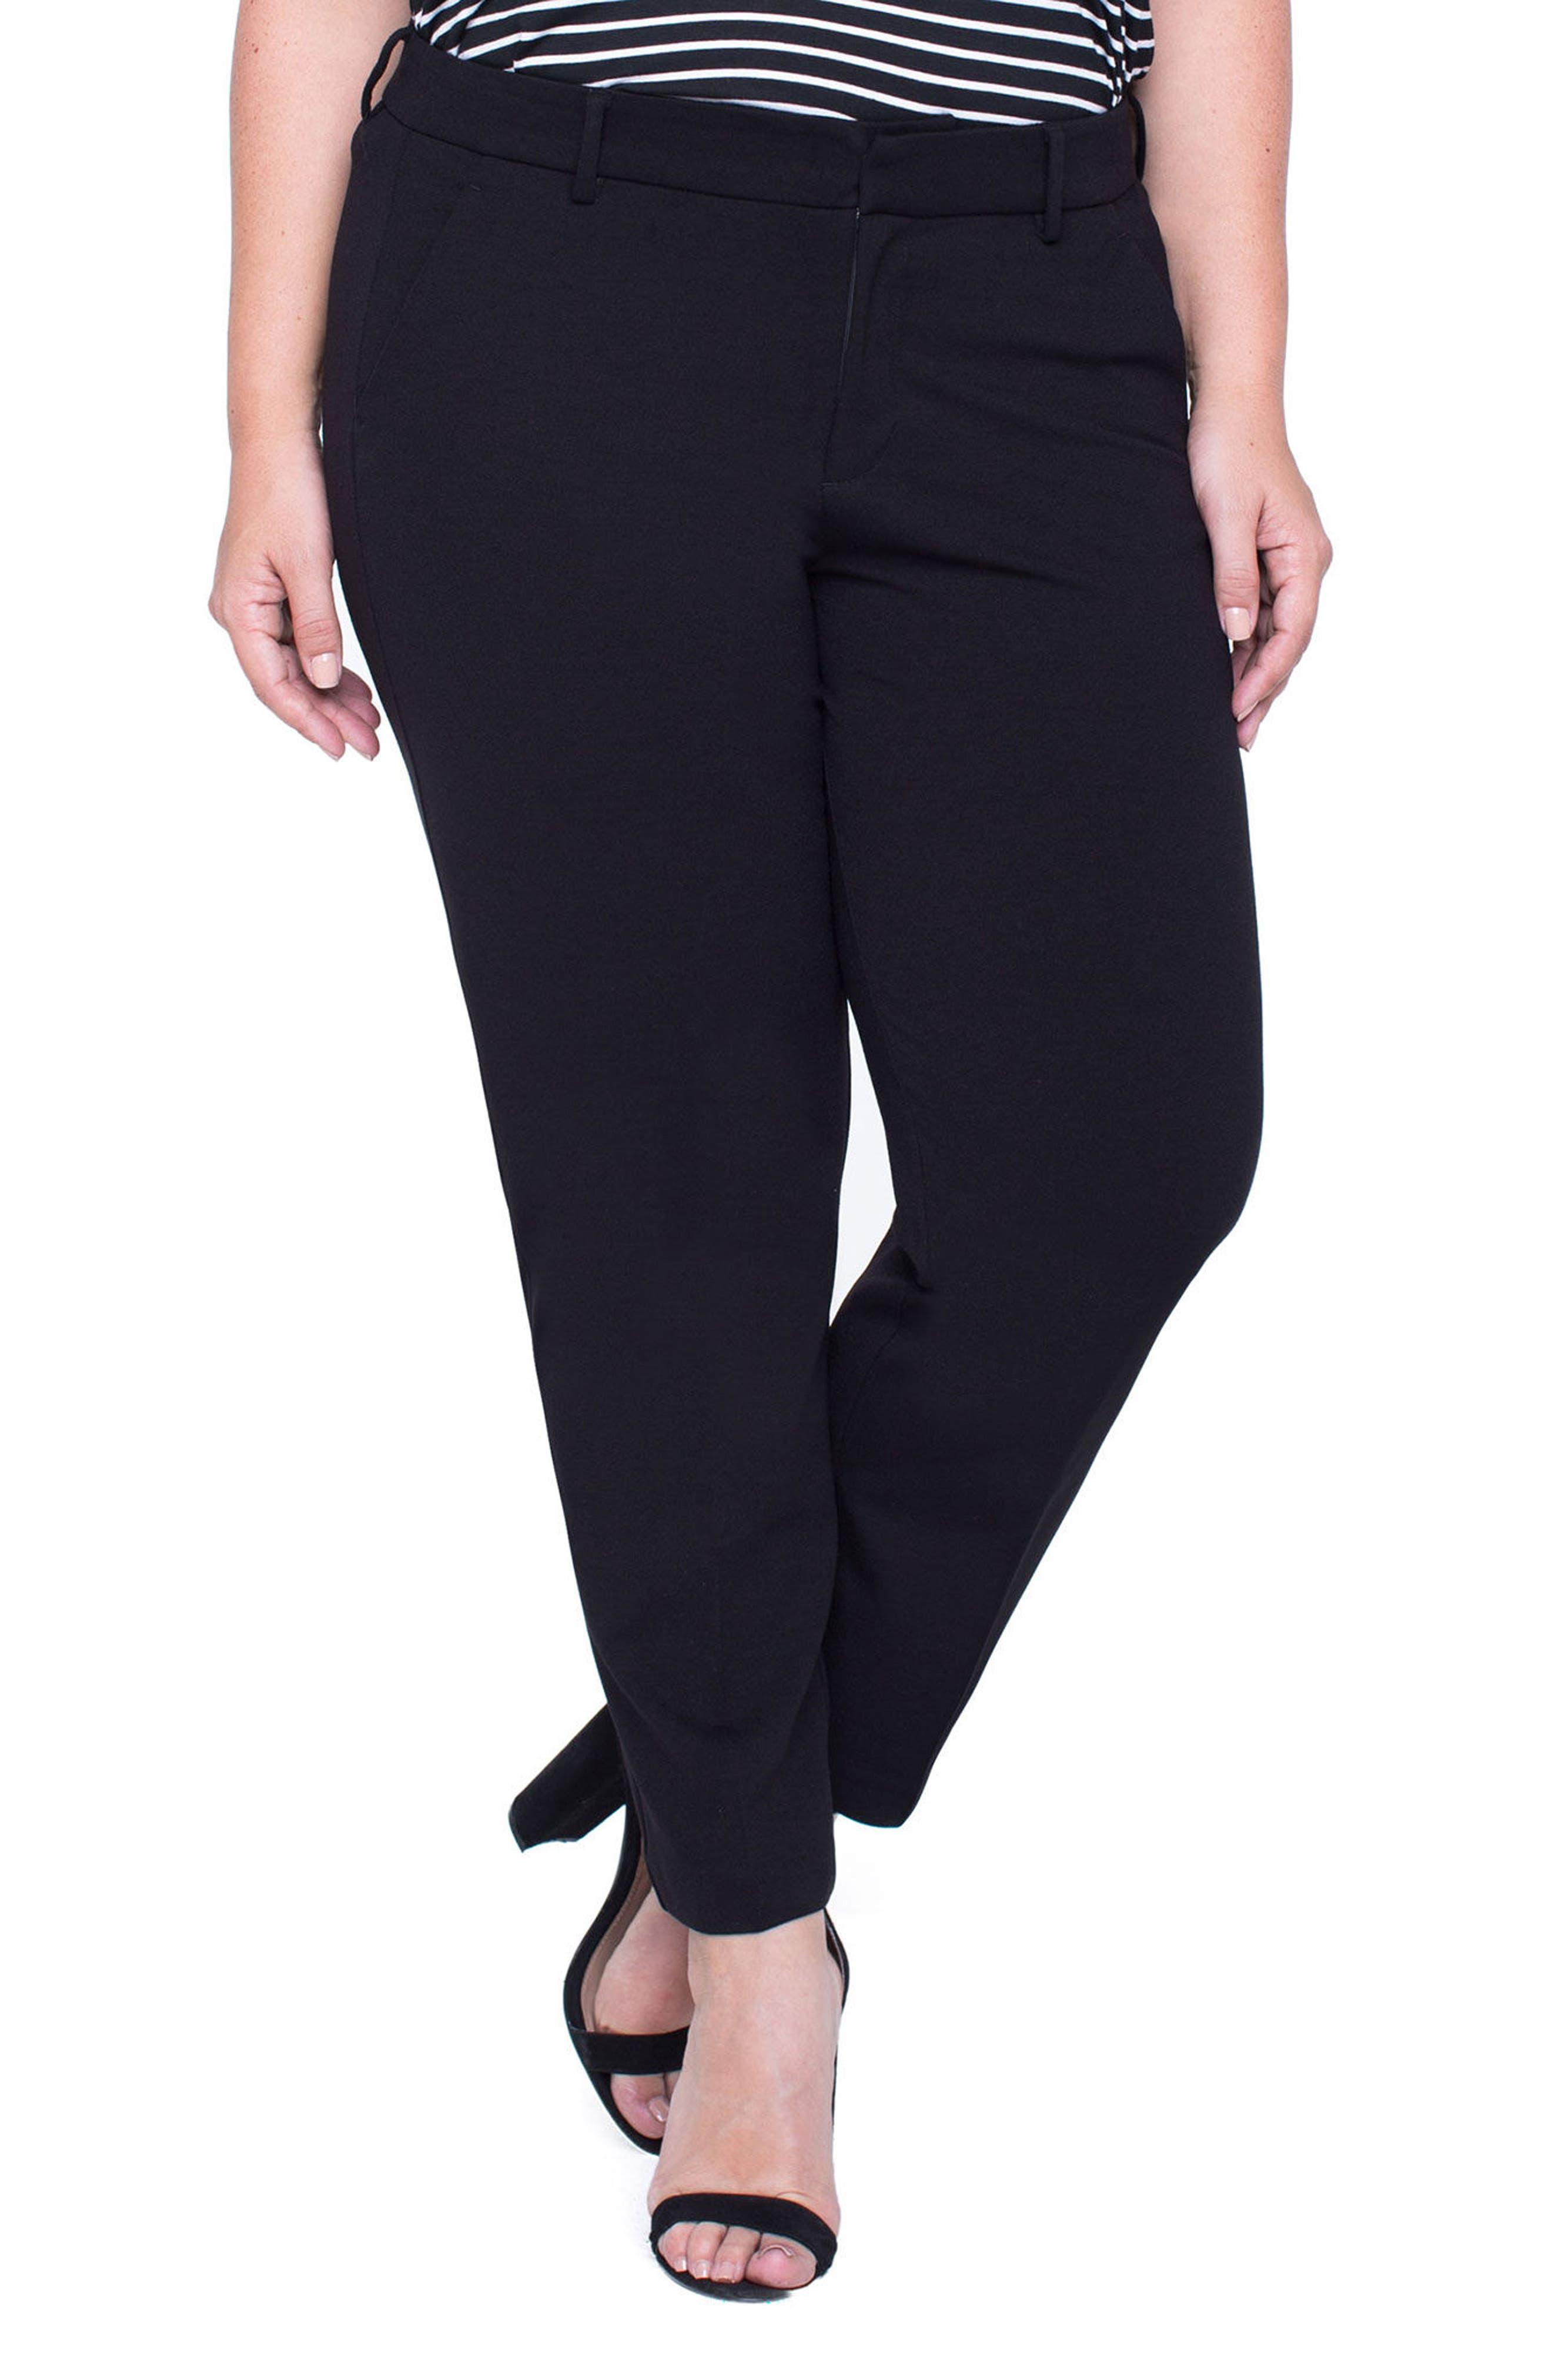 LIVERPOOL Kelsey Ponte Knit Trousers, Main, color, BLACK